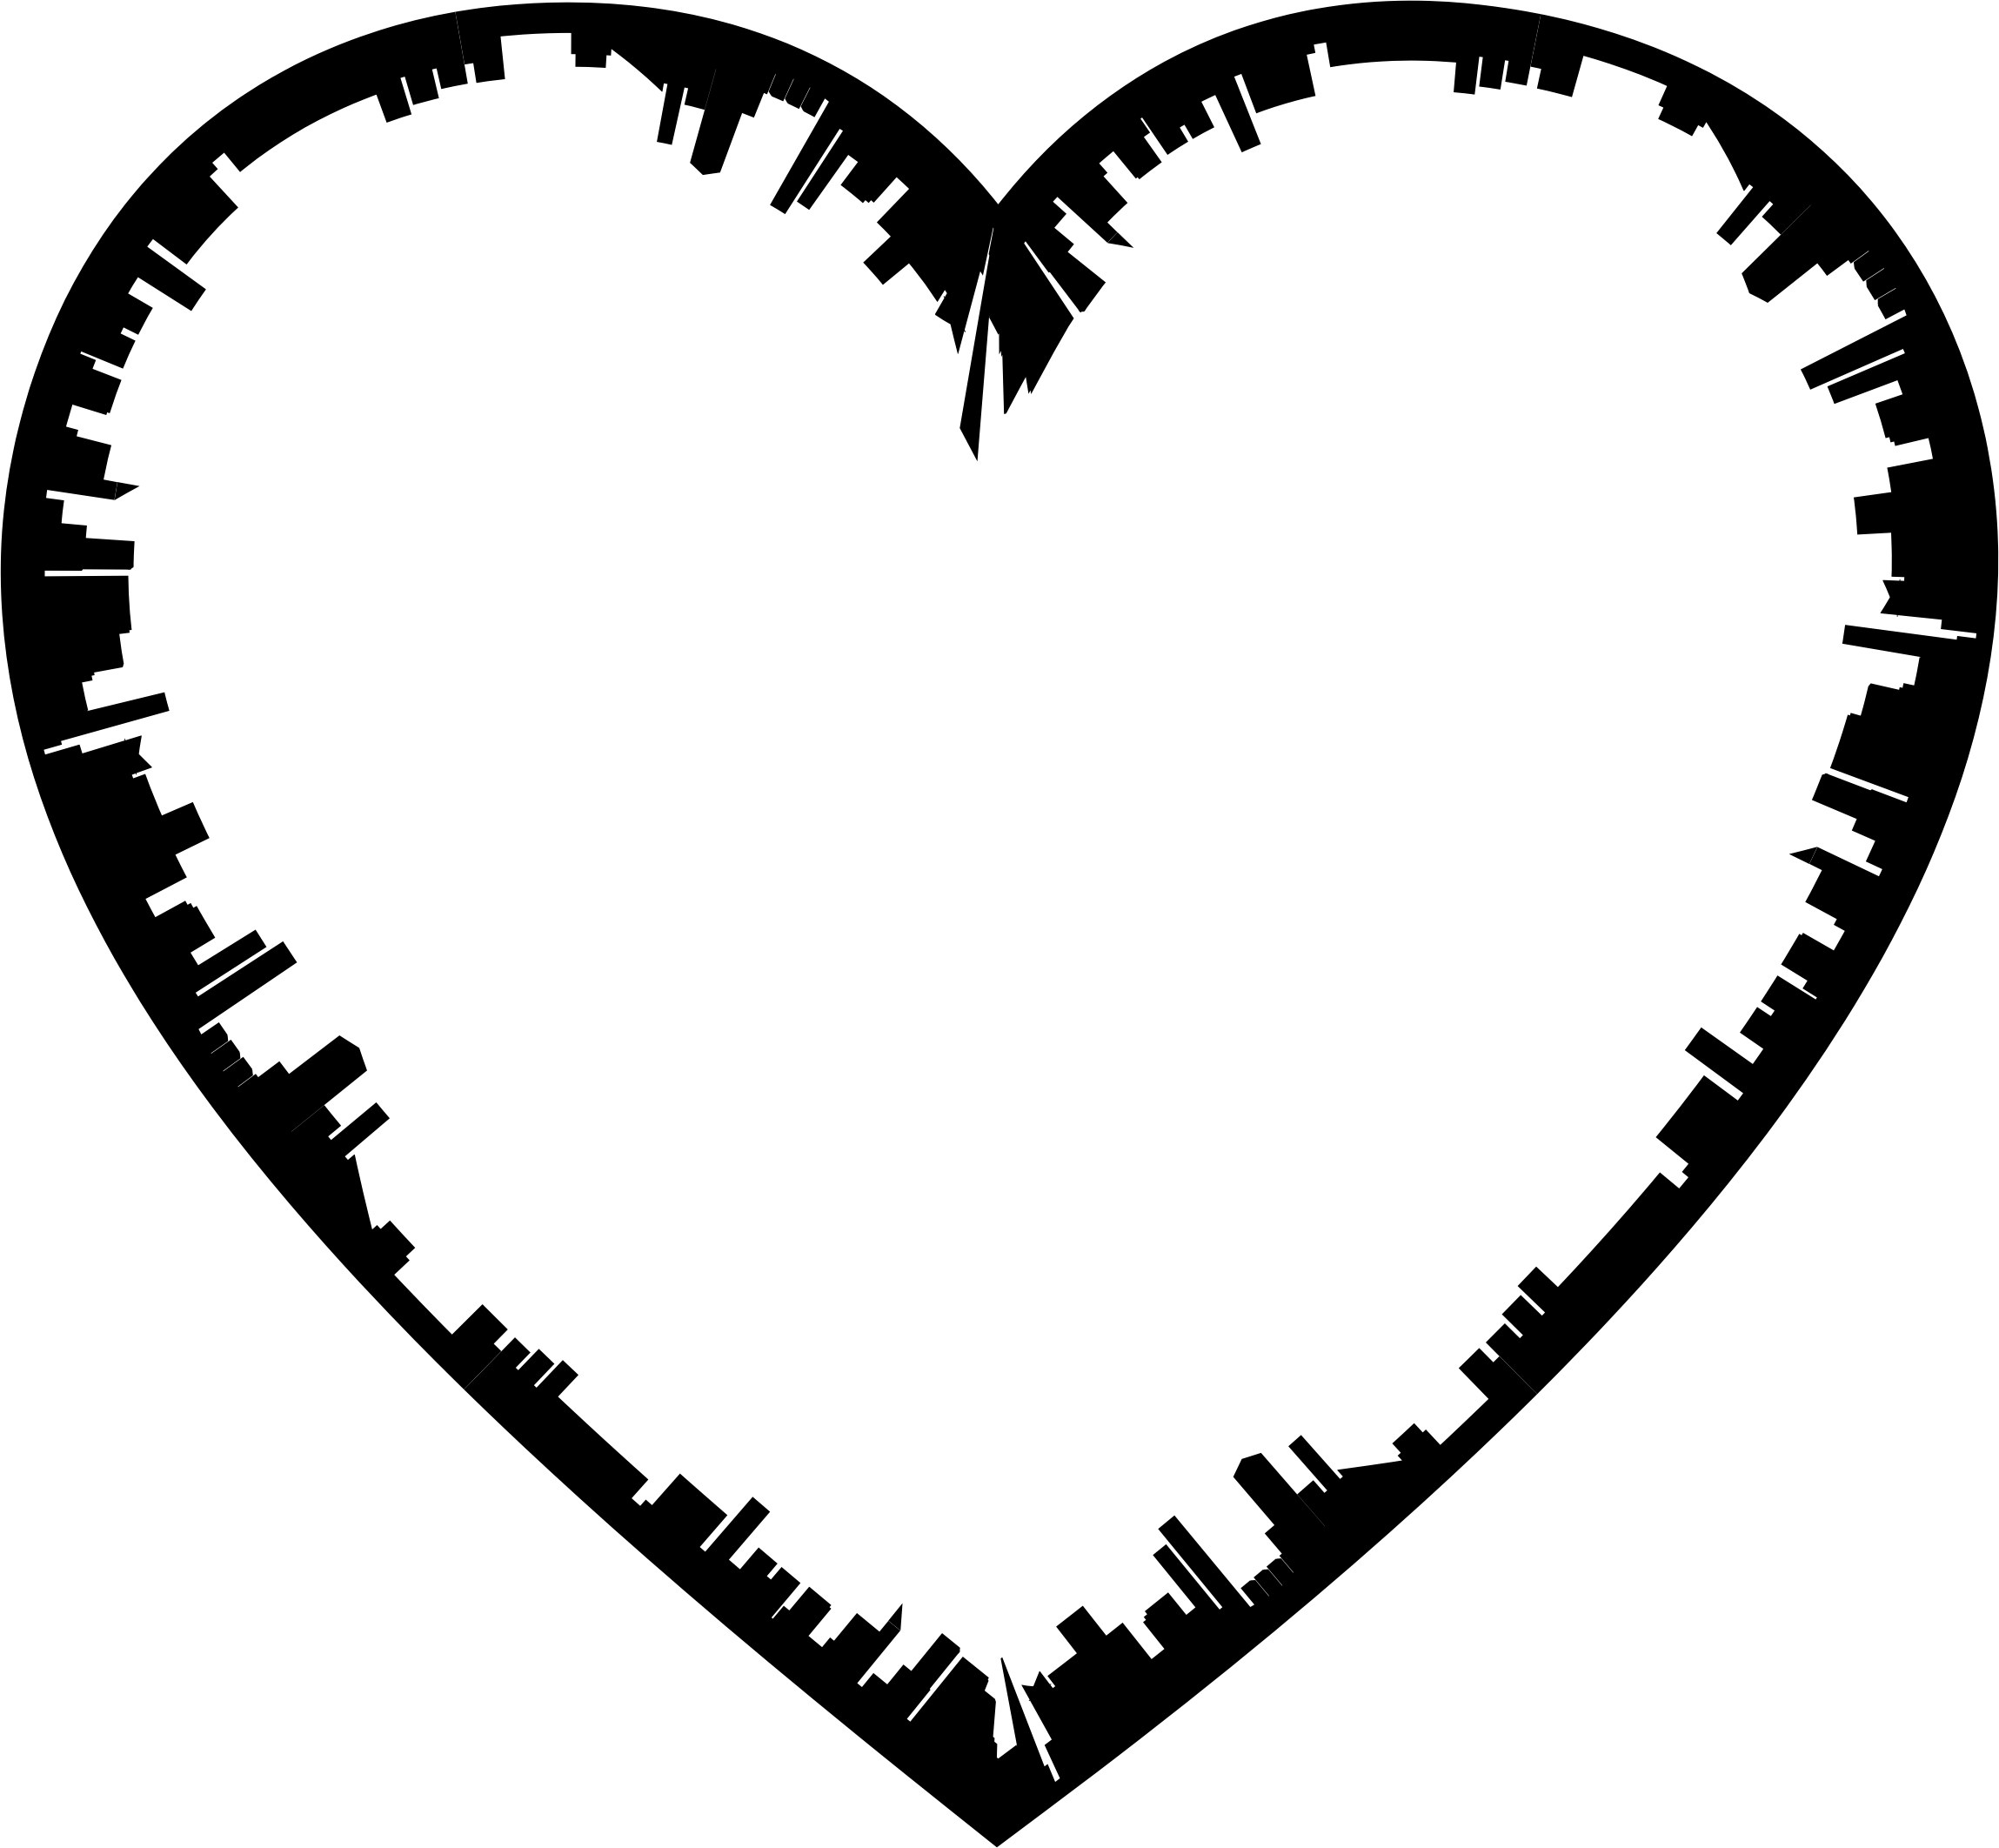 2298x2124 Clipart